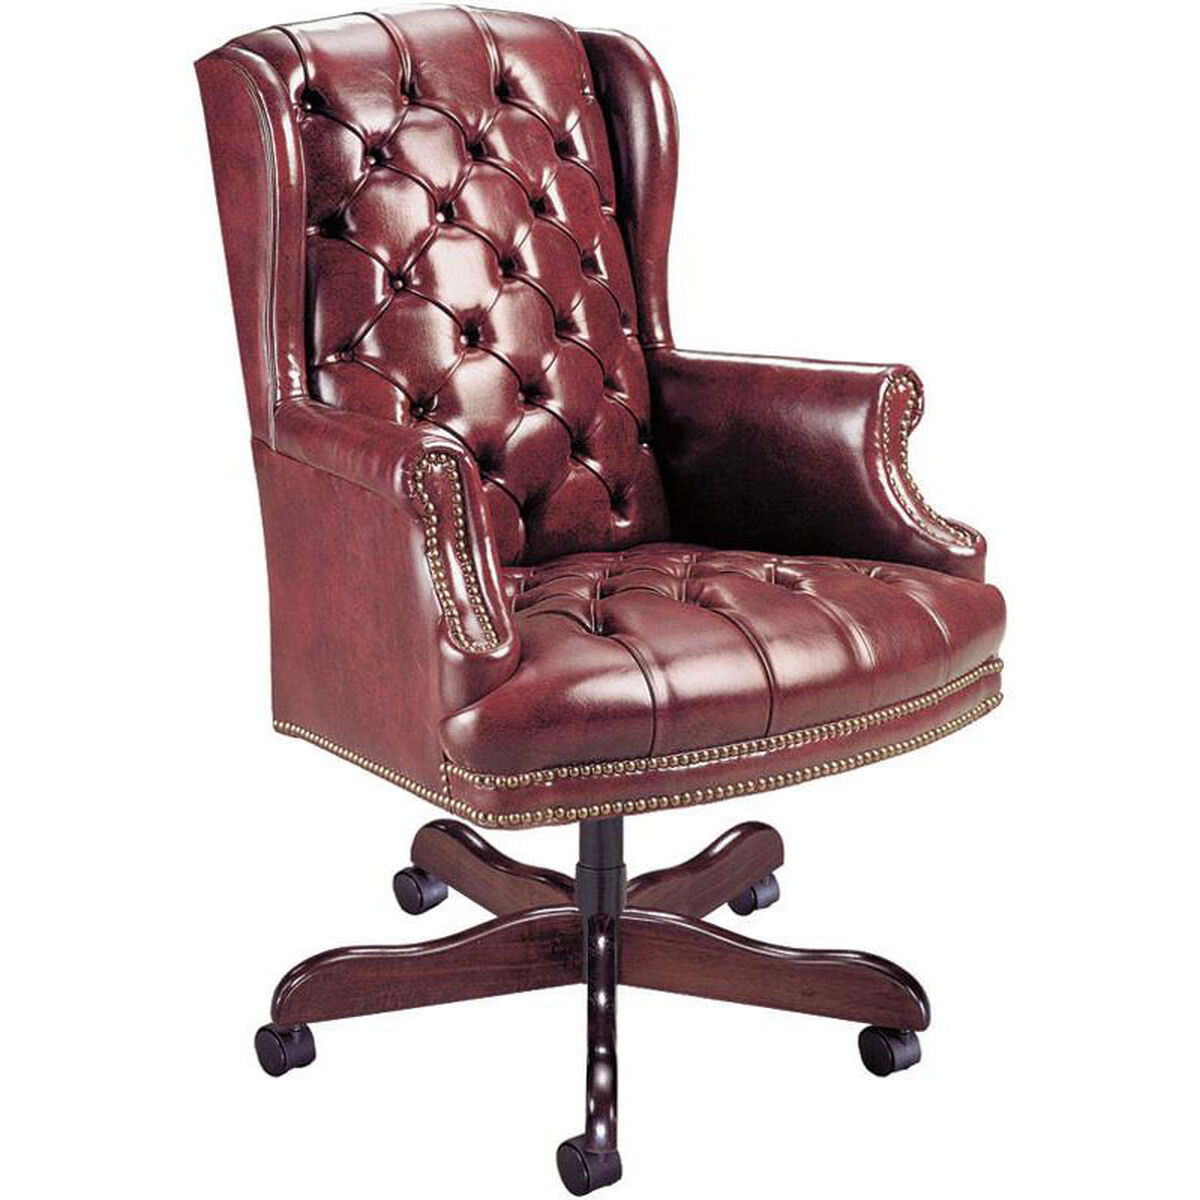 High Point Furniture Industries 4078 Hpf 4078